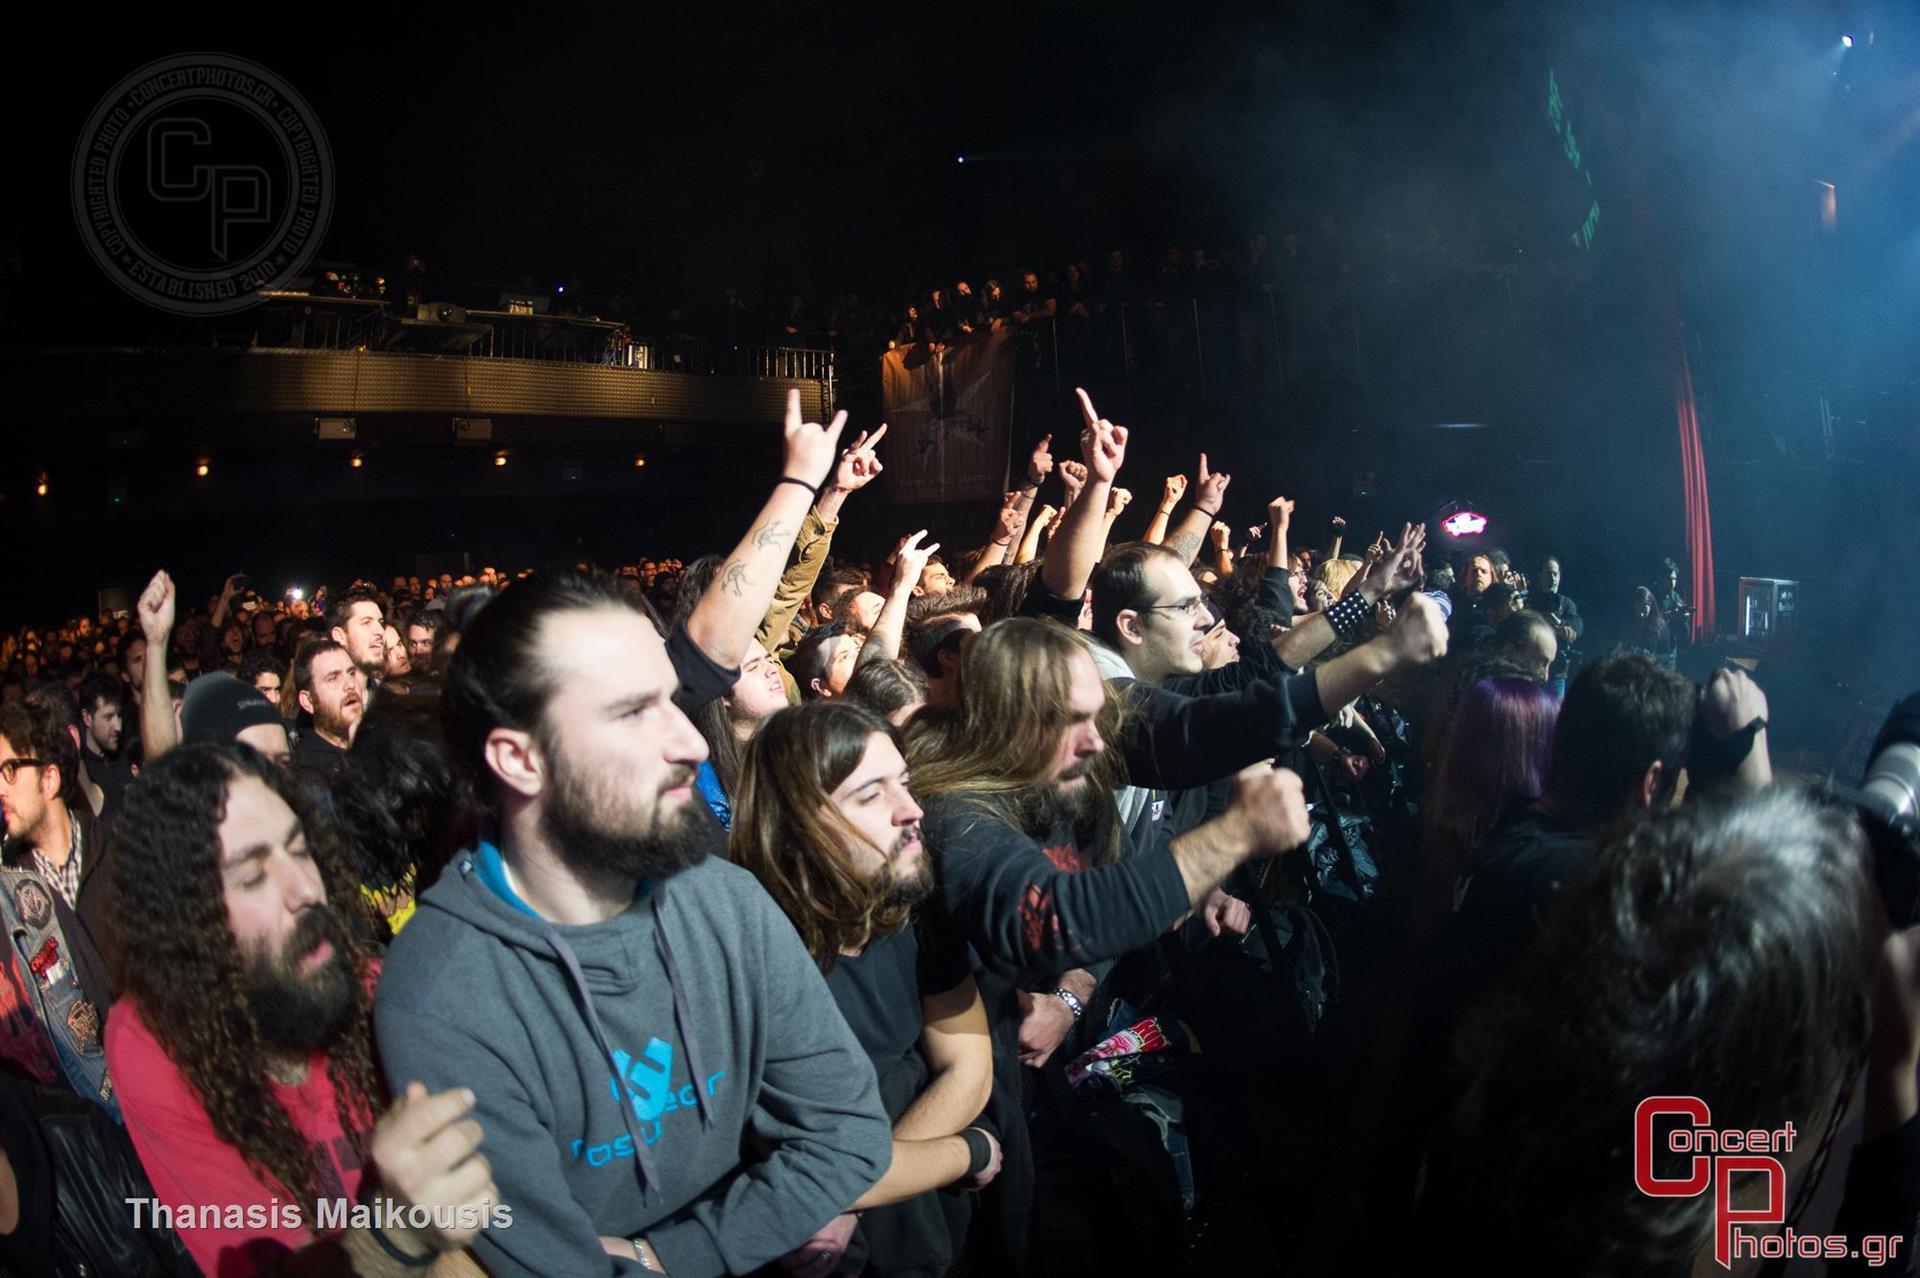 At The Gates-At The Gates Fuzz photographer: Thanasis Maikousis - ConcertPhotos - 20150109_2337_39